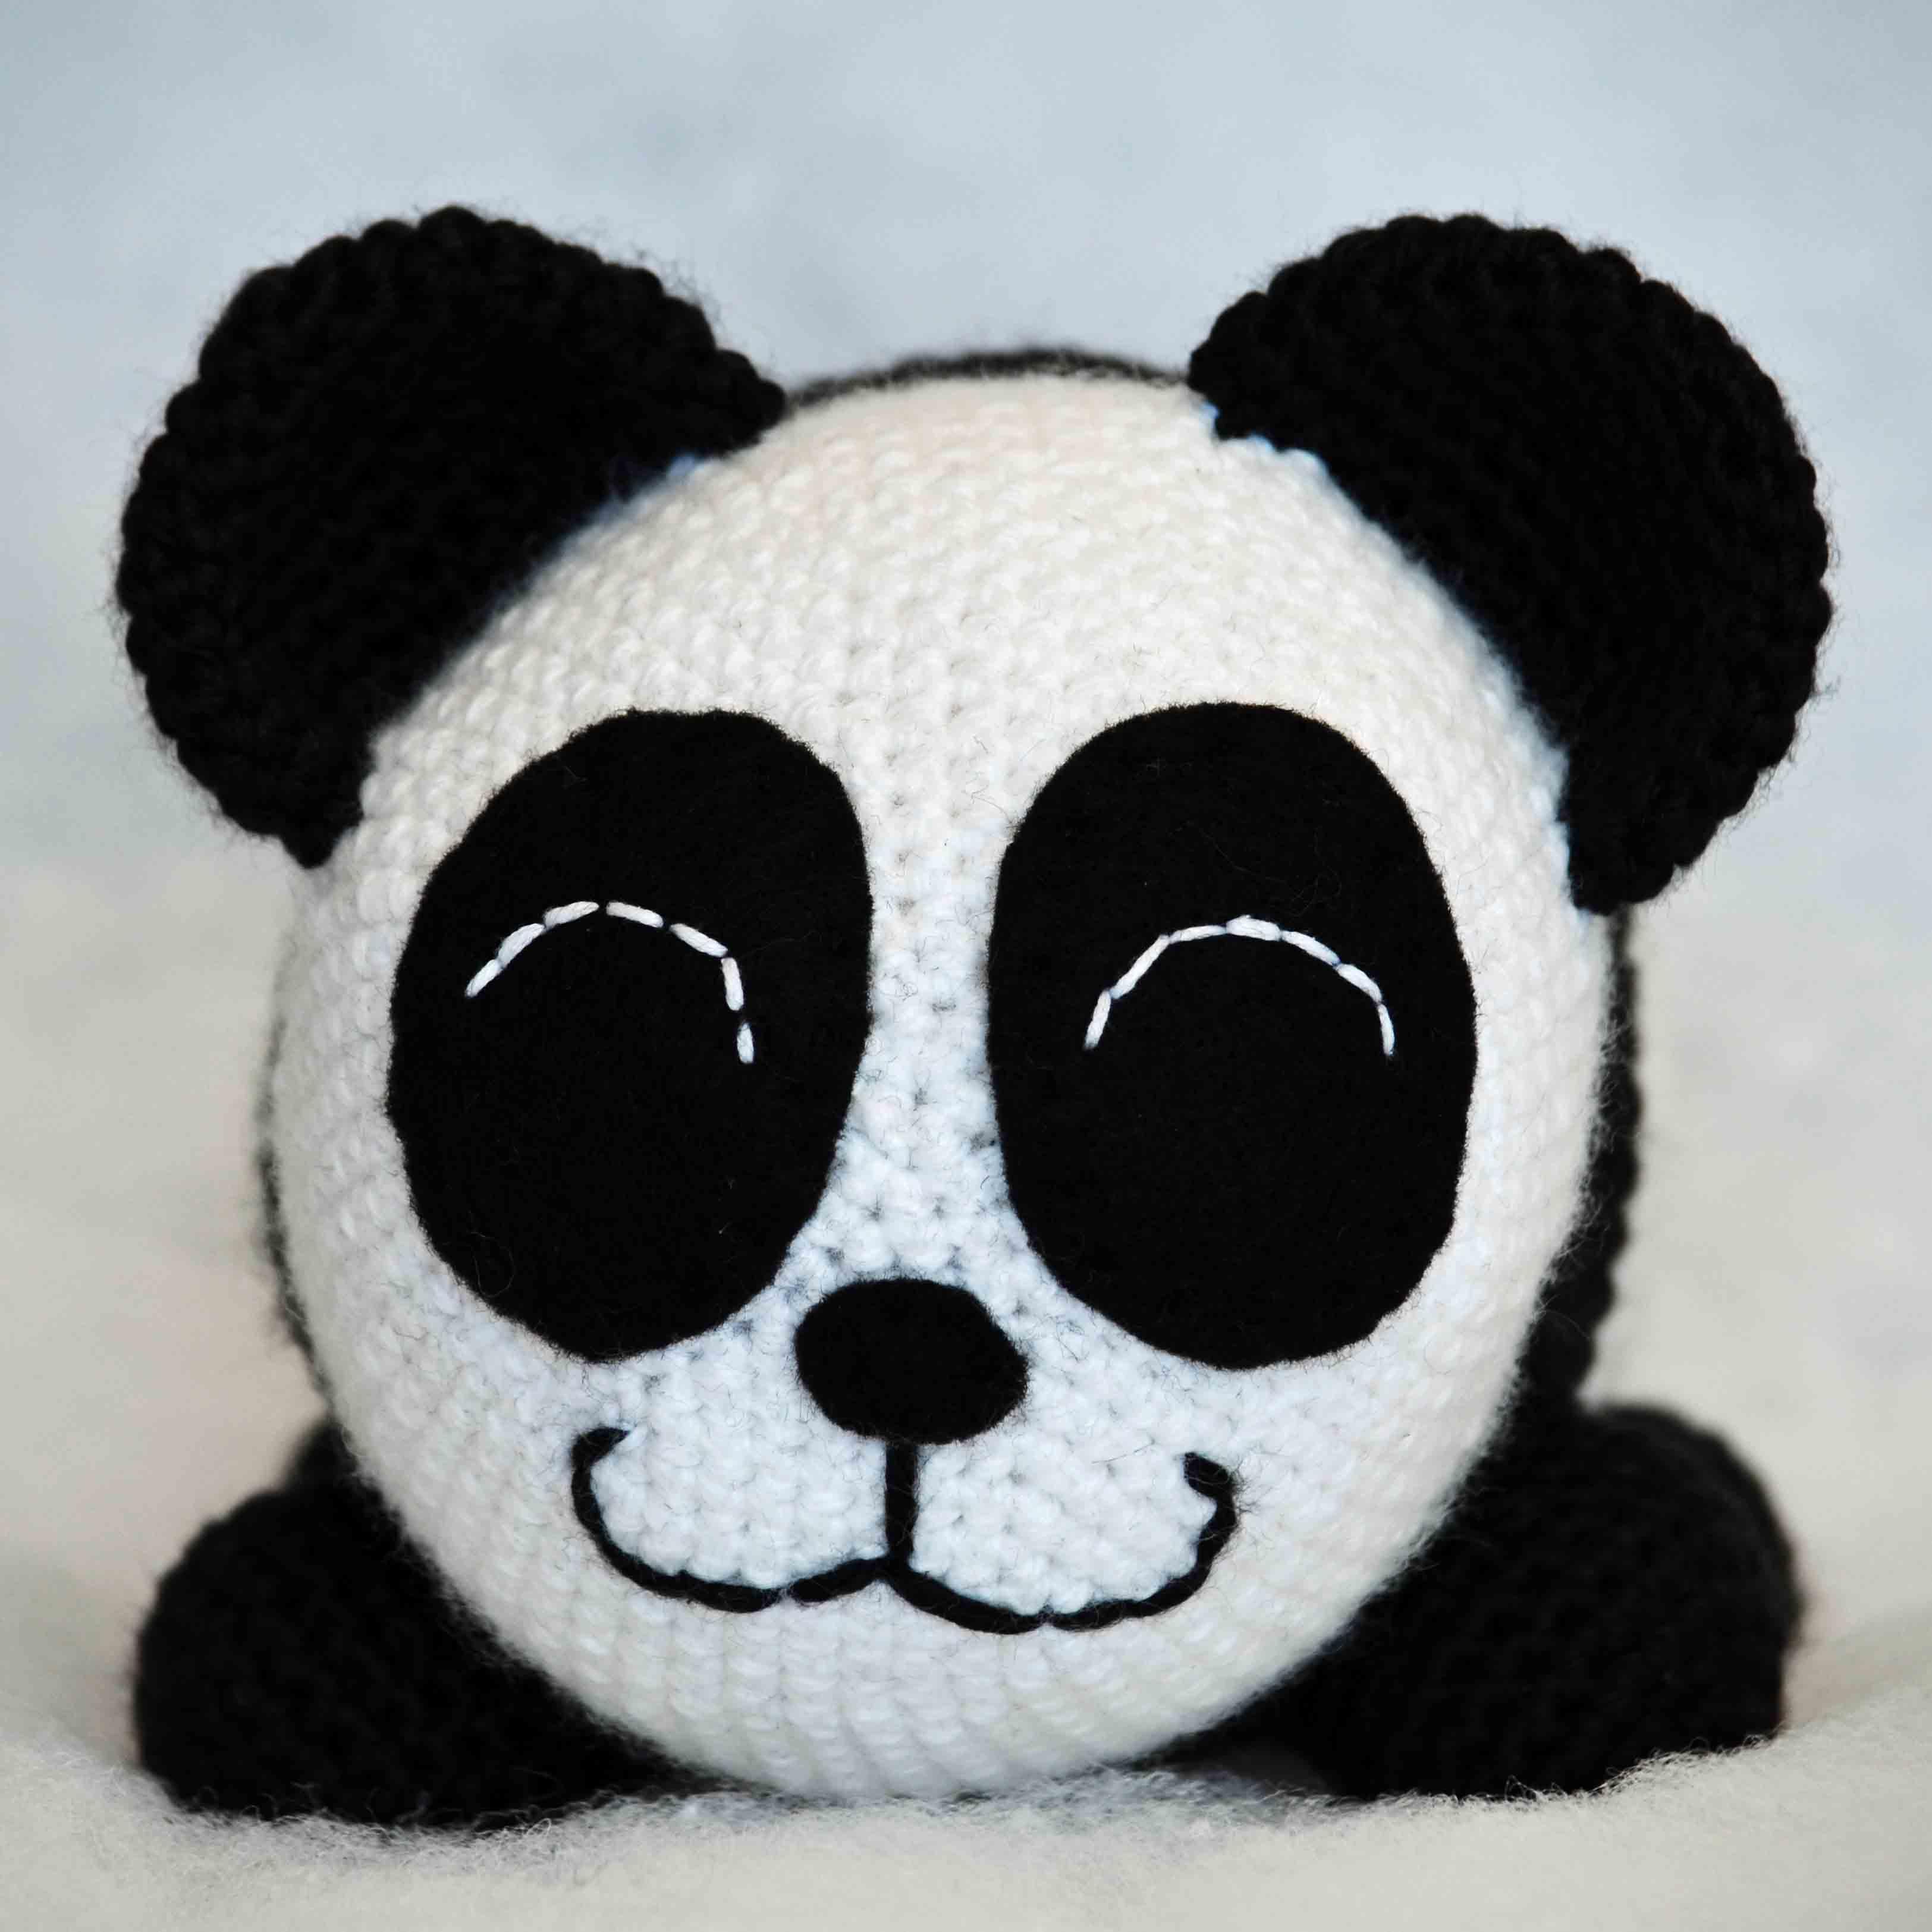 Amigurumi Guinea Pig Pattern Free : Amigurumi and Crochet Patterns DIY Geekery